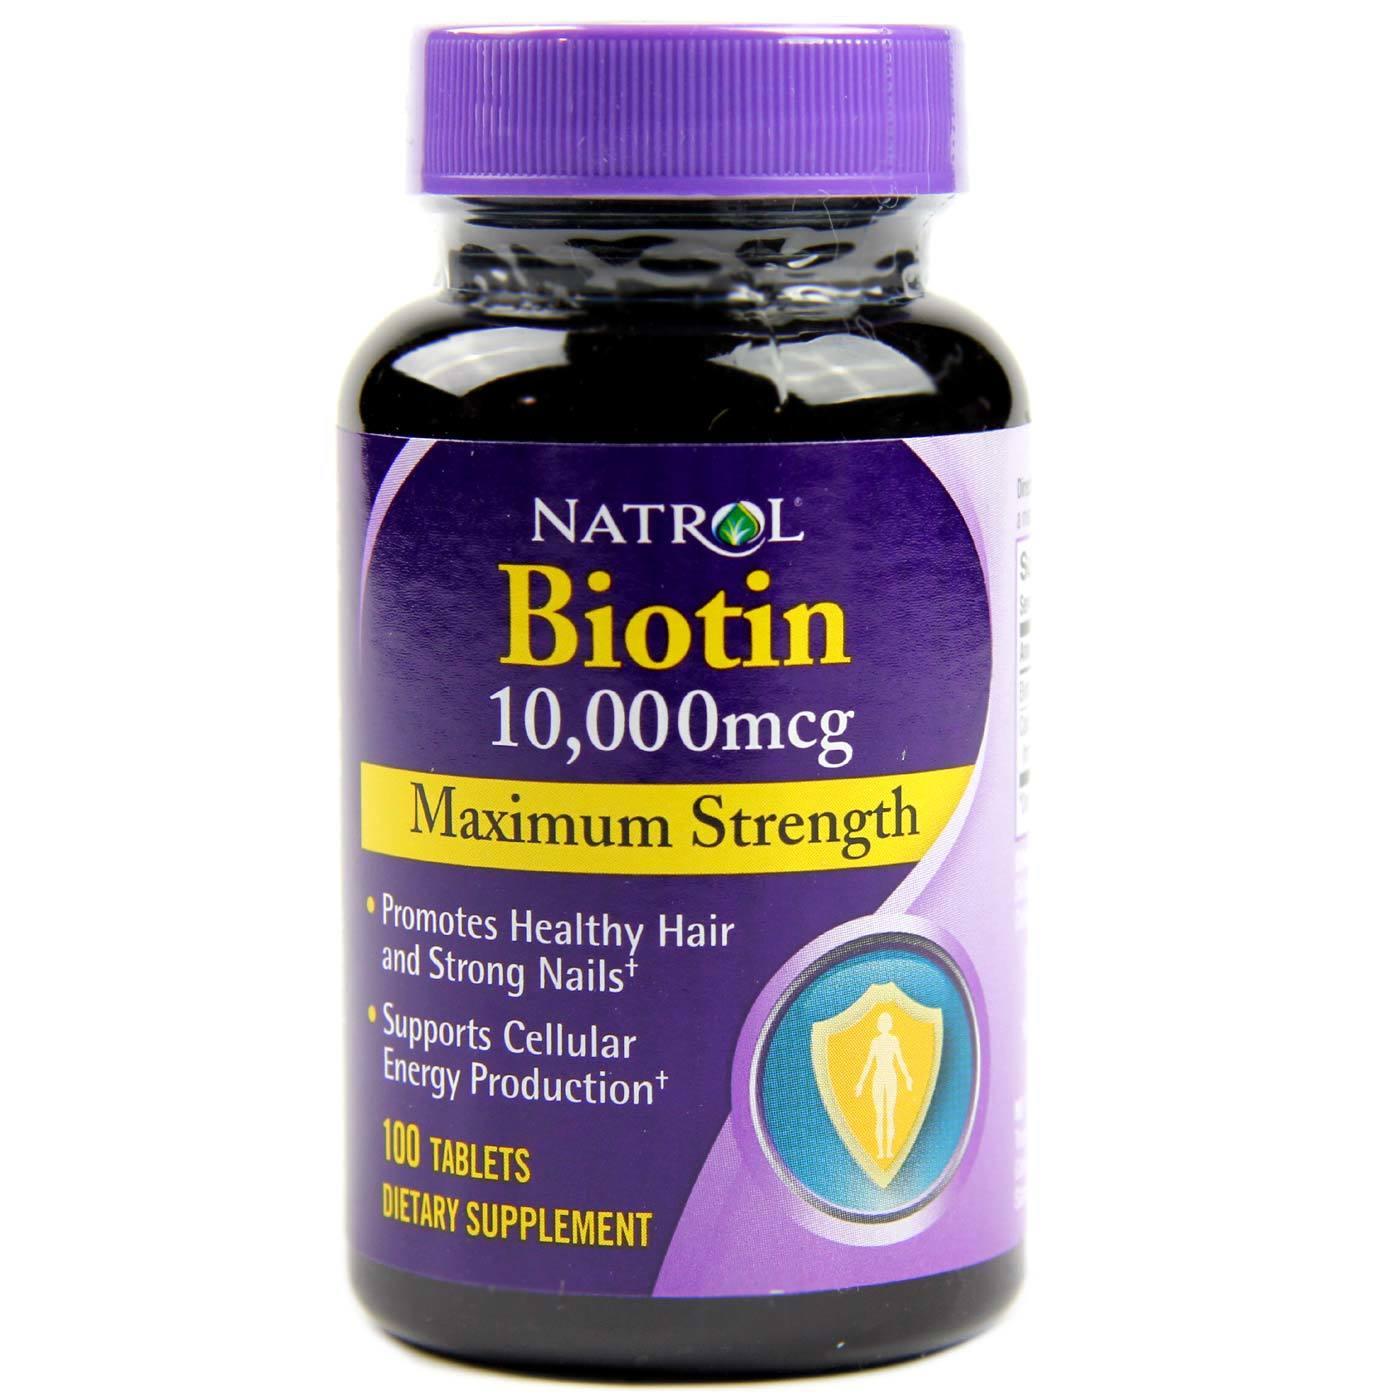 Image result for Biotin